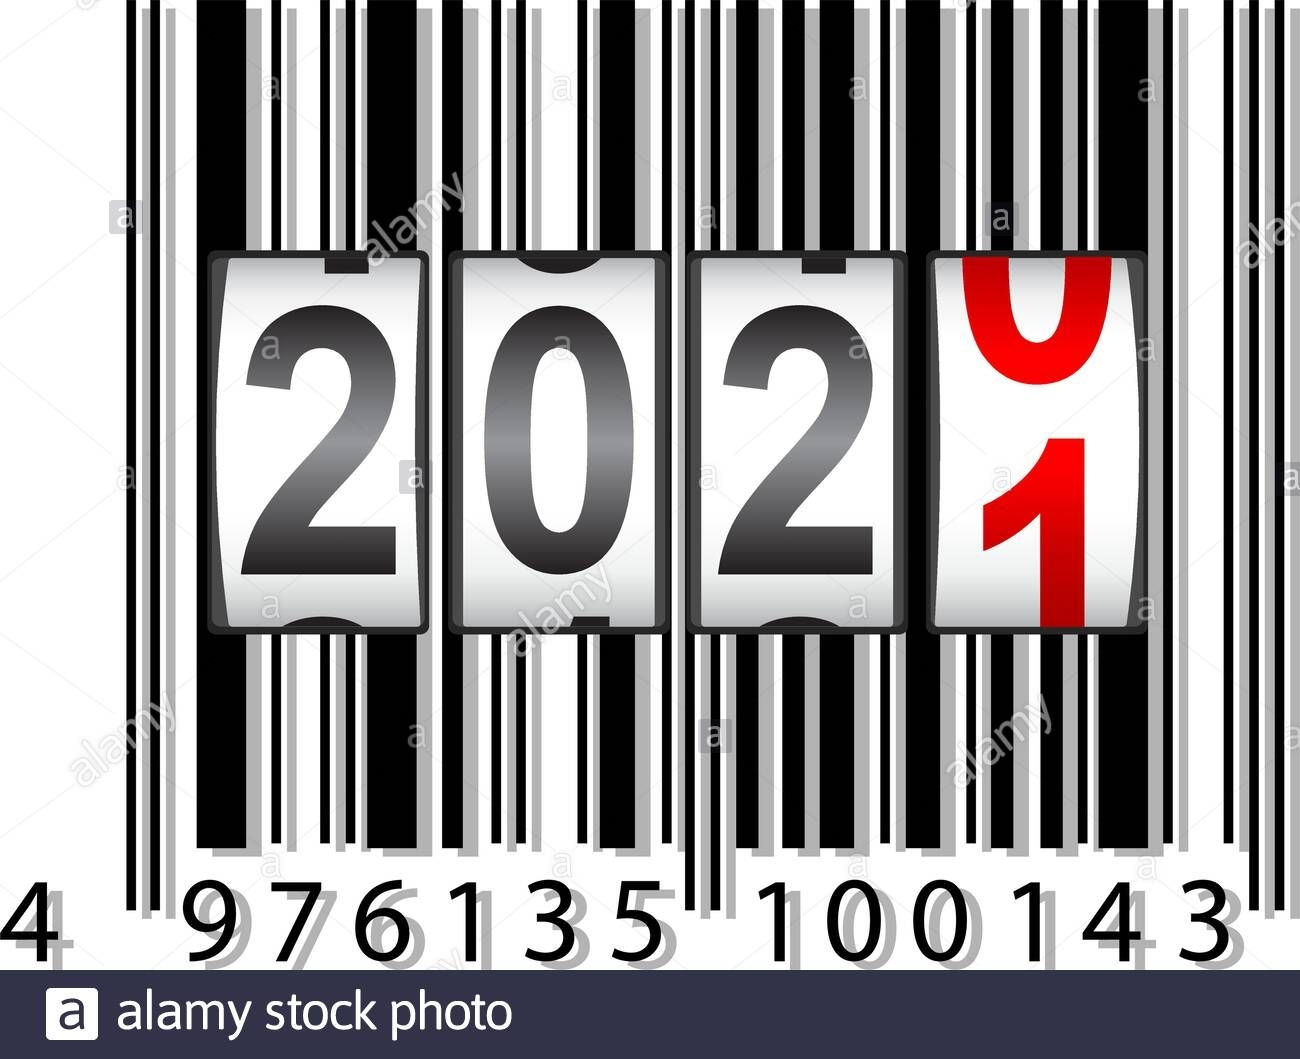 2021 New Year Counter, Barcode Calendar Illustration Stock